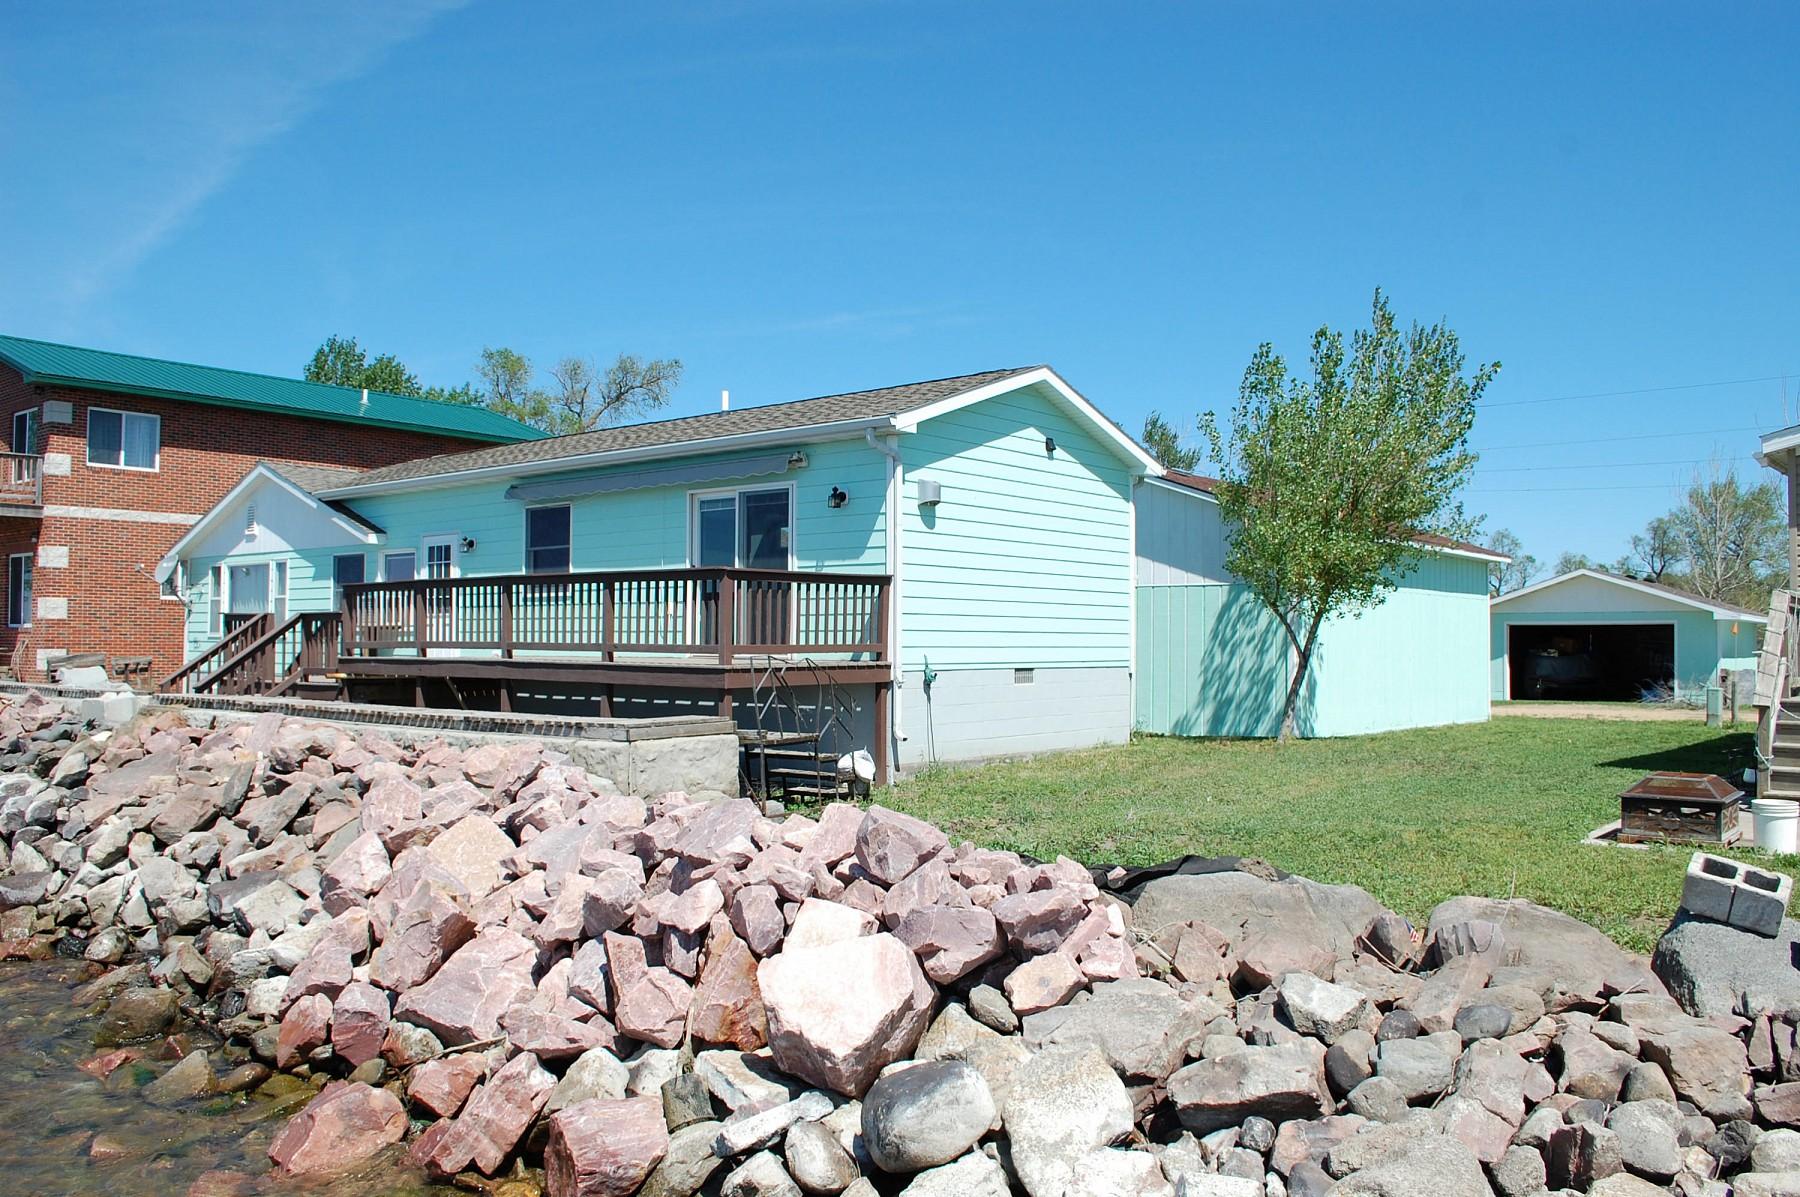 130 LakeDrive, Castlewood, SD 57223